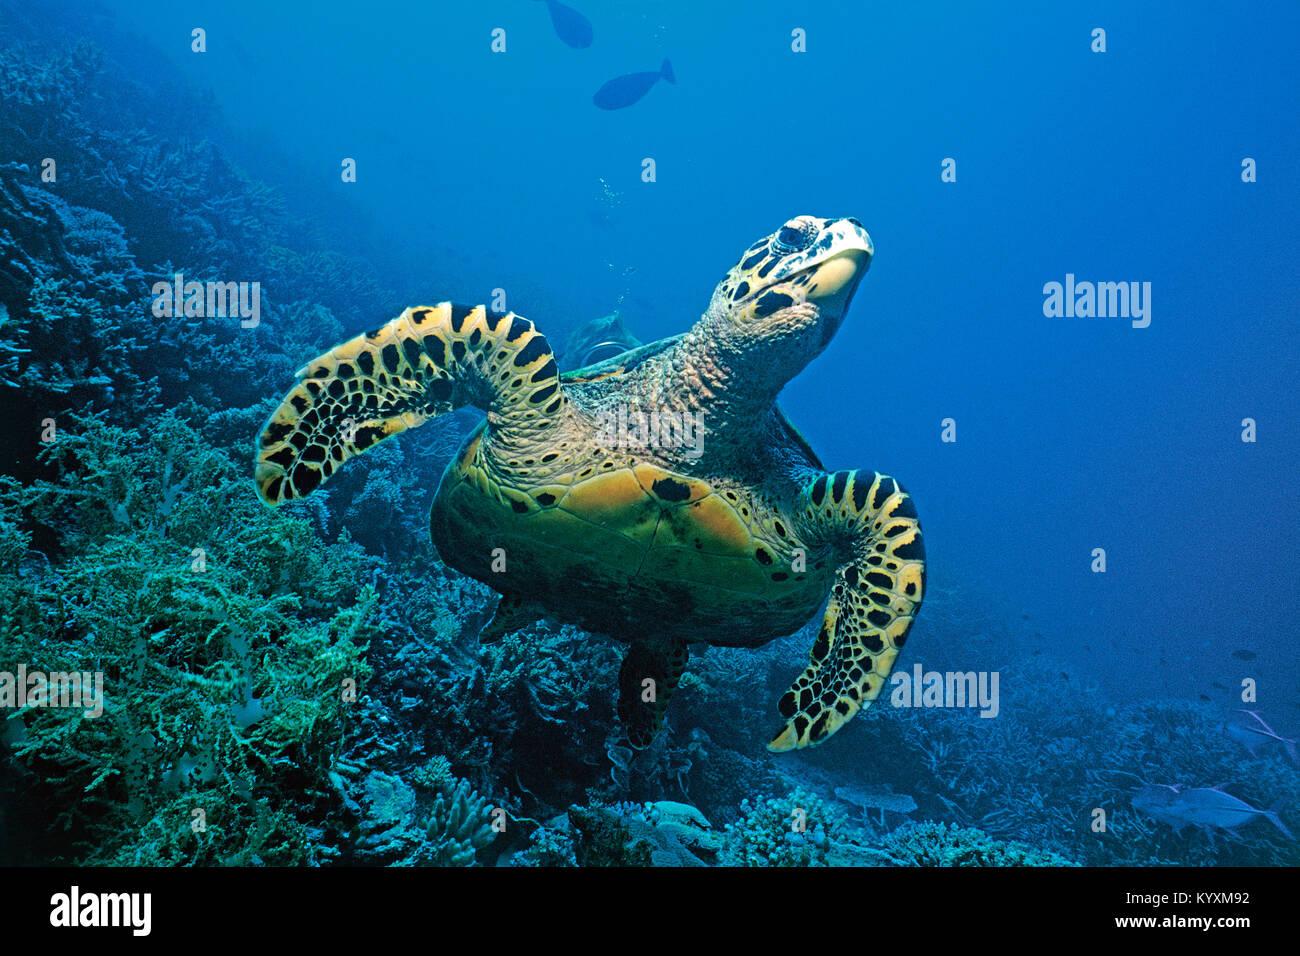 Hawksbill turtle (Eretmochelys imbricata), Maldives islands, Indian ocean, Asia Stock Photo